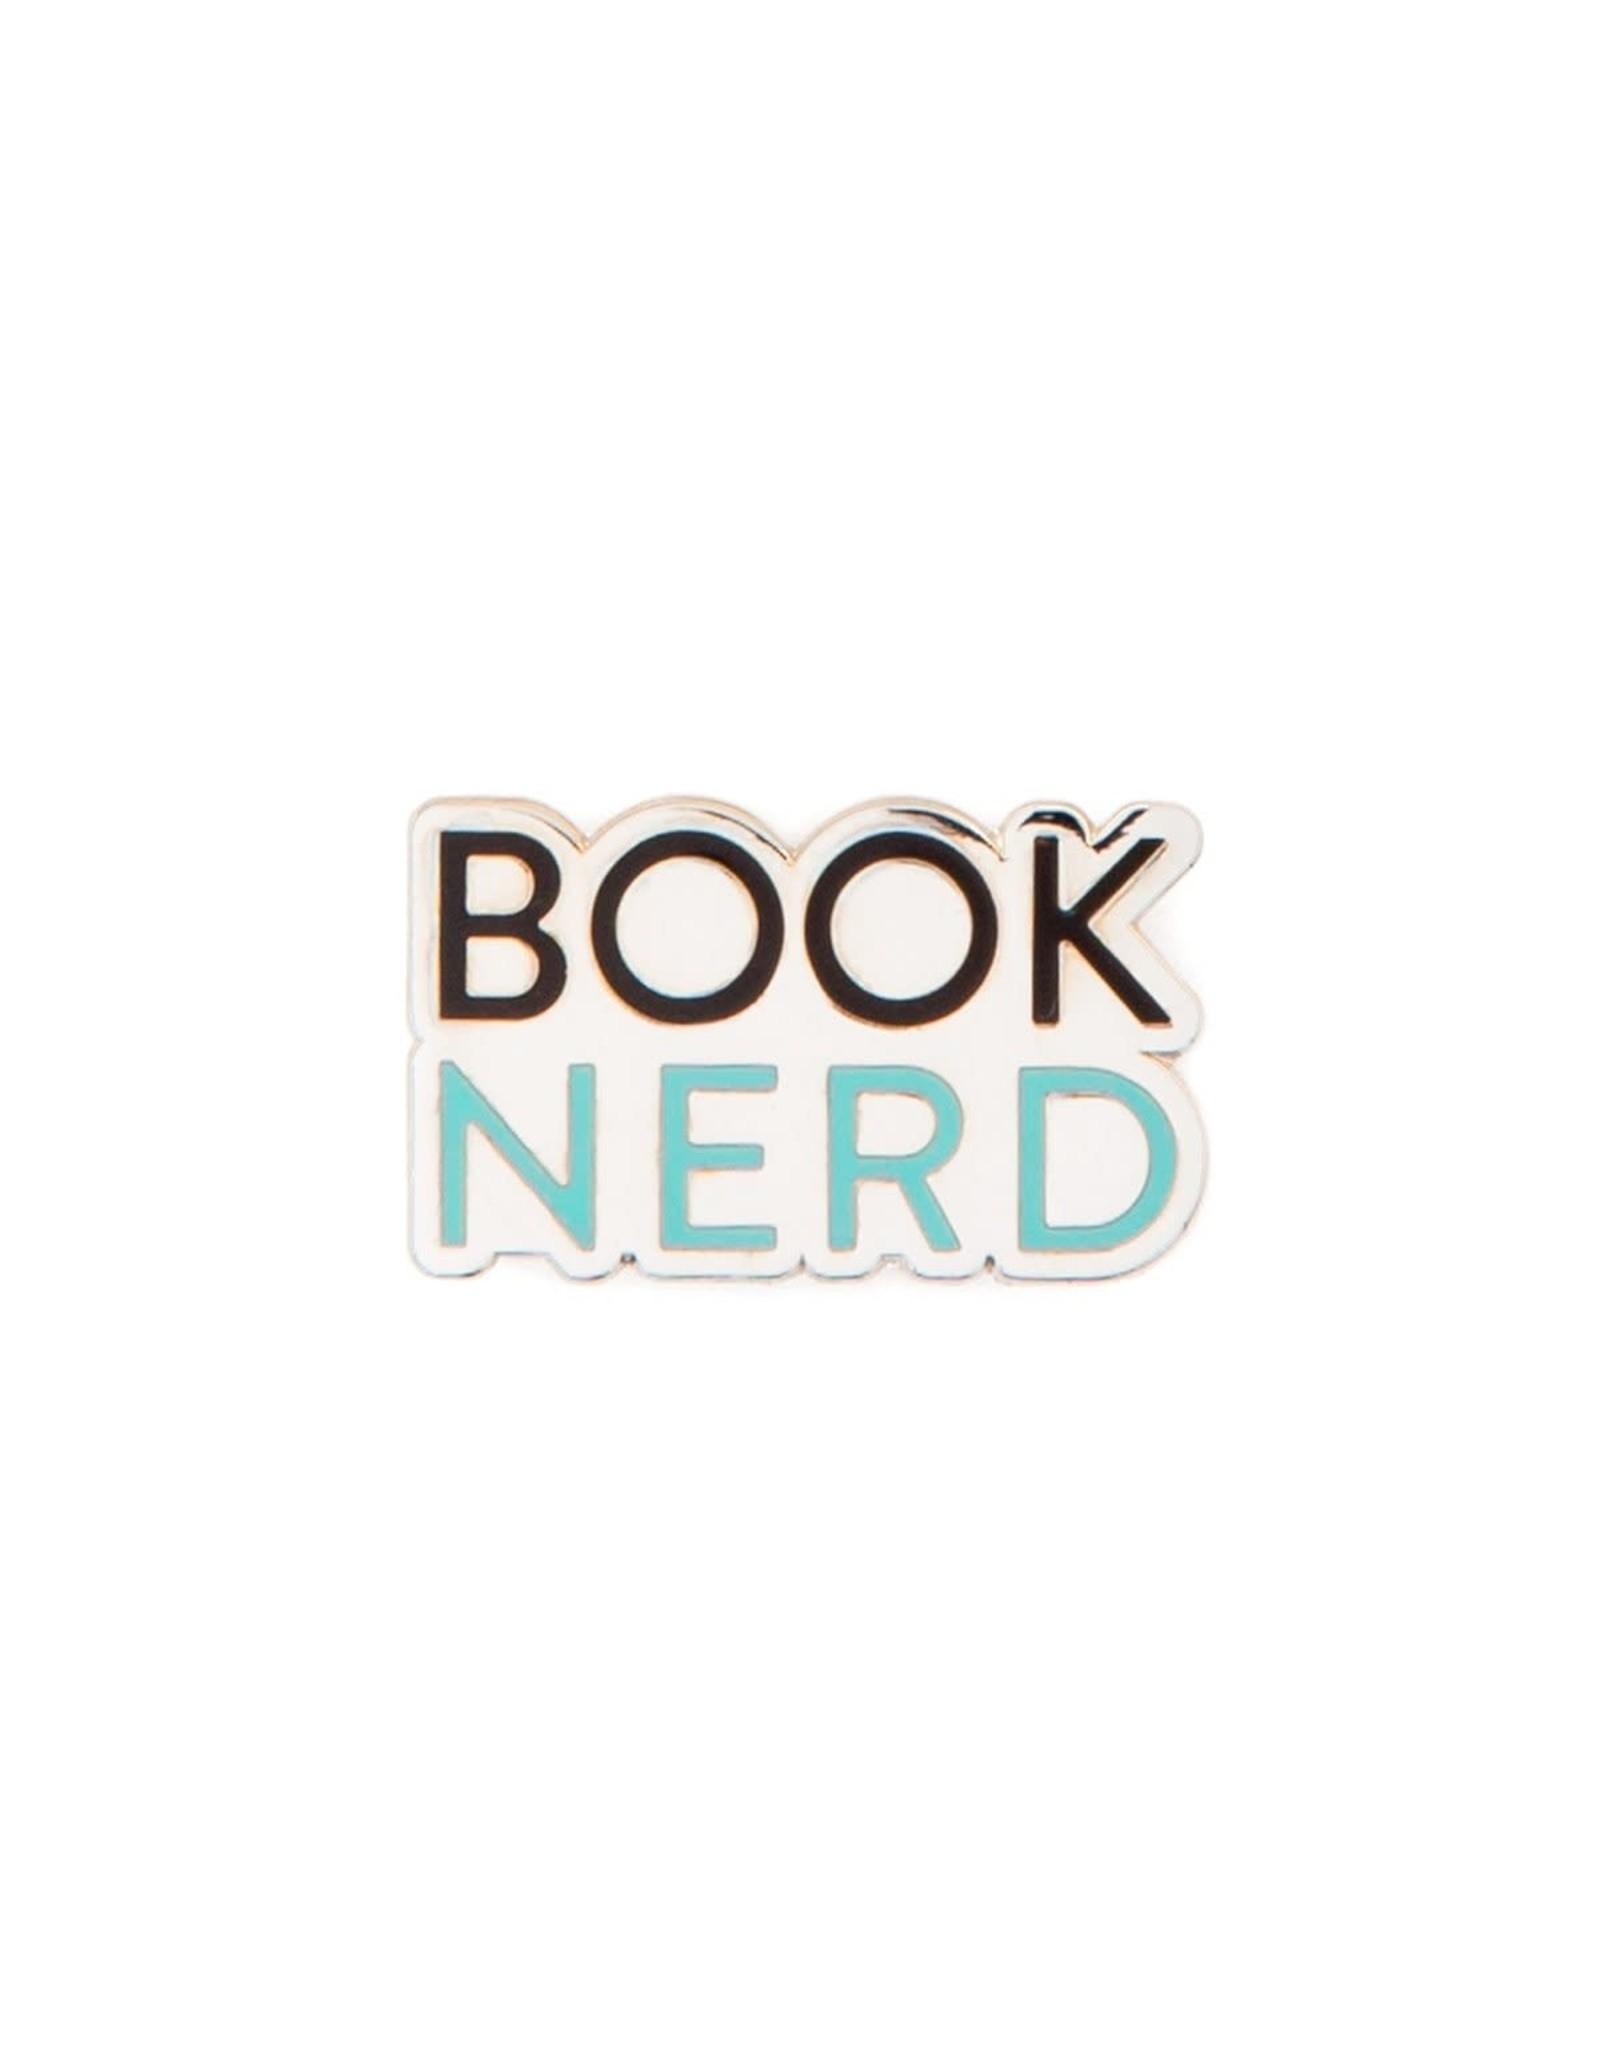 Book Nerd Enamel Pin